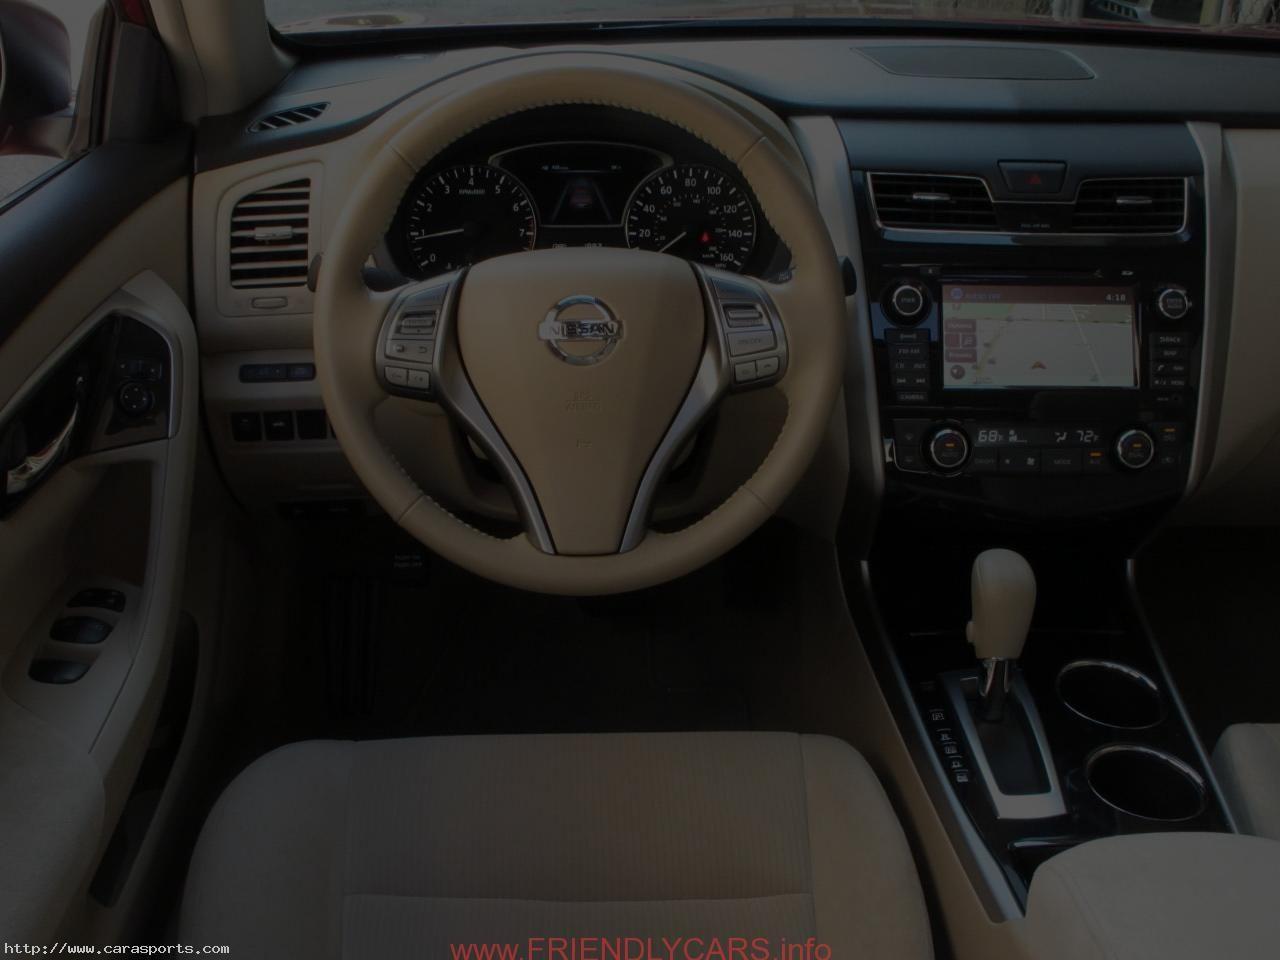 Nissan Altima 2014 Interior Car Images Hd Alifiah Sites Nissan Nissan Altima Nissan Cars